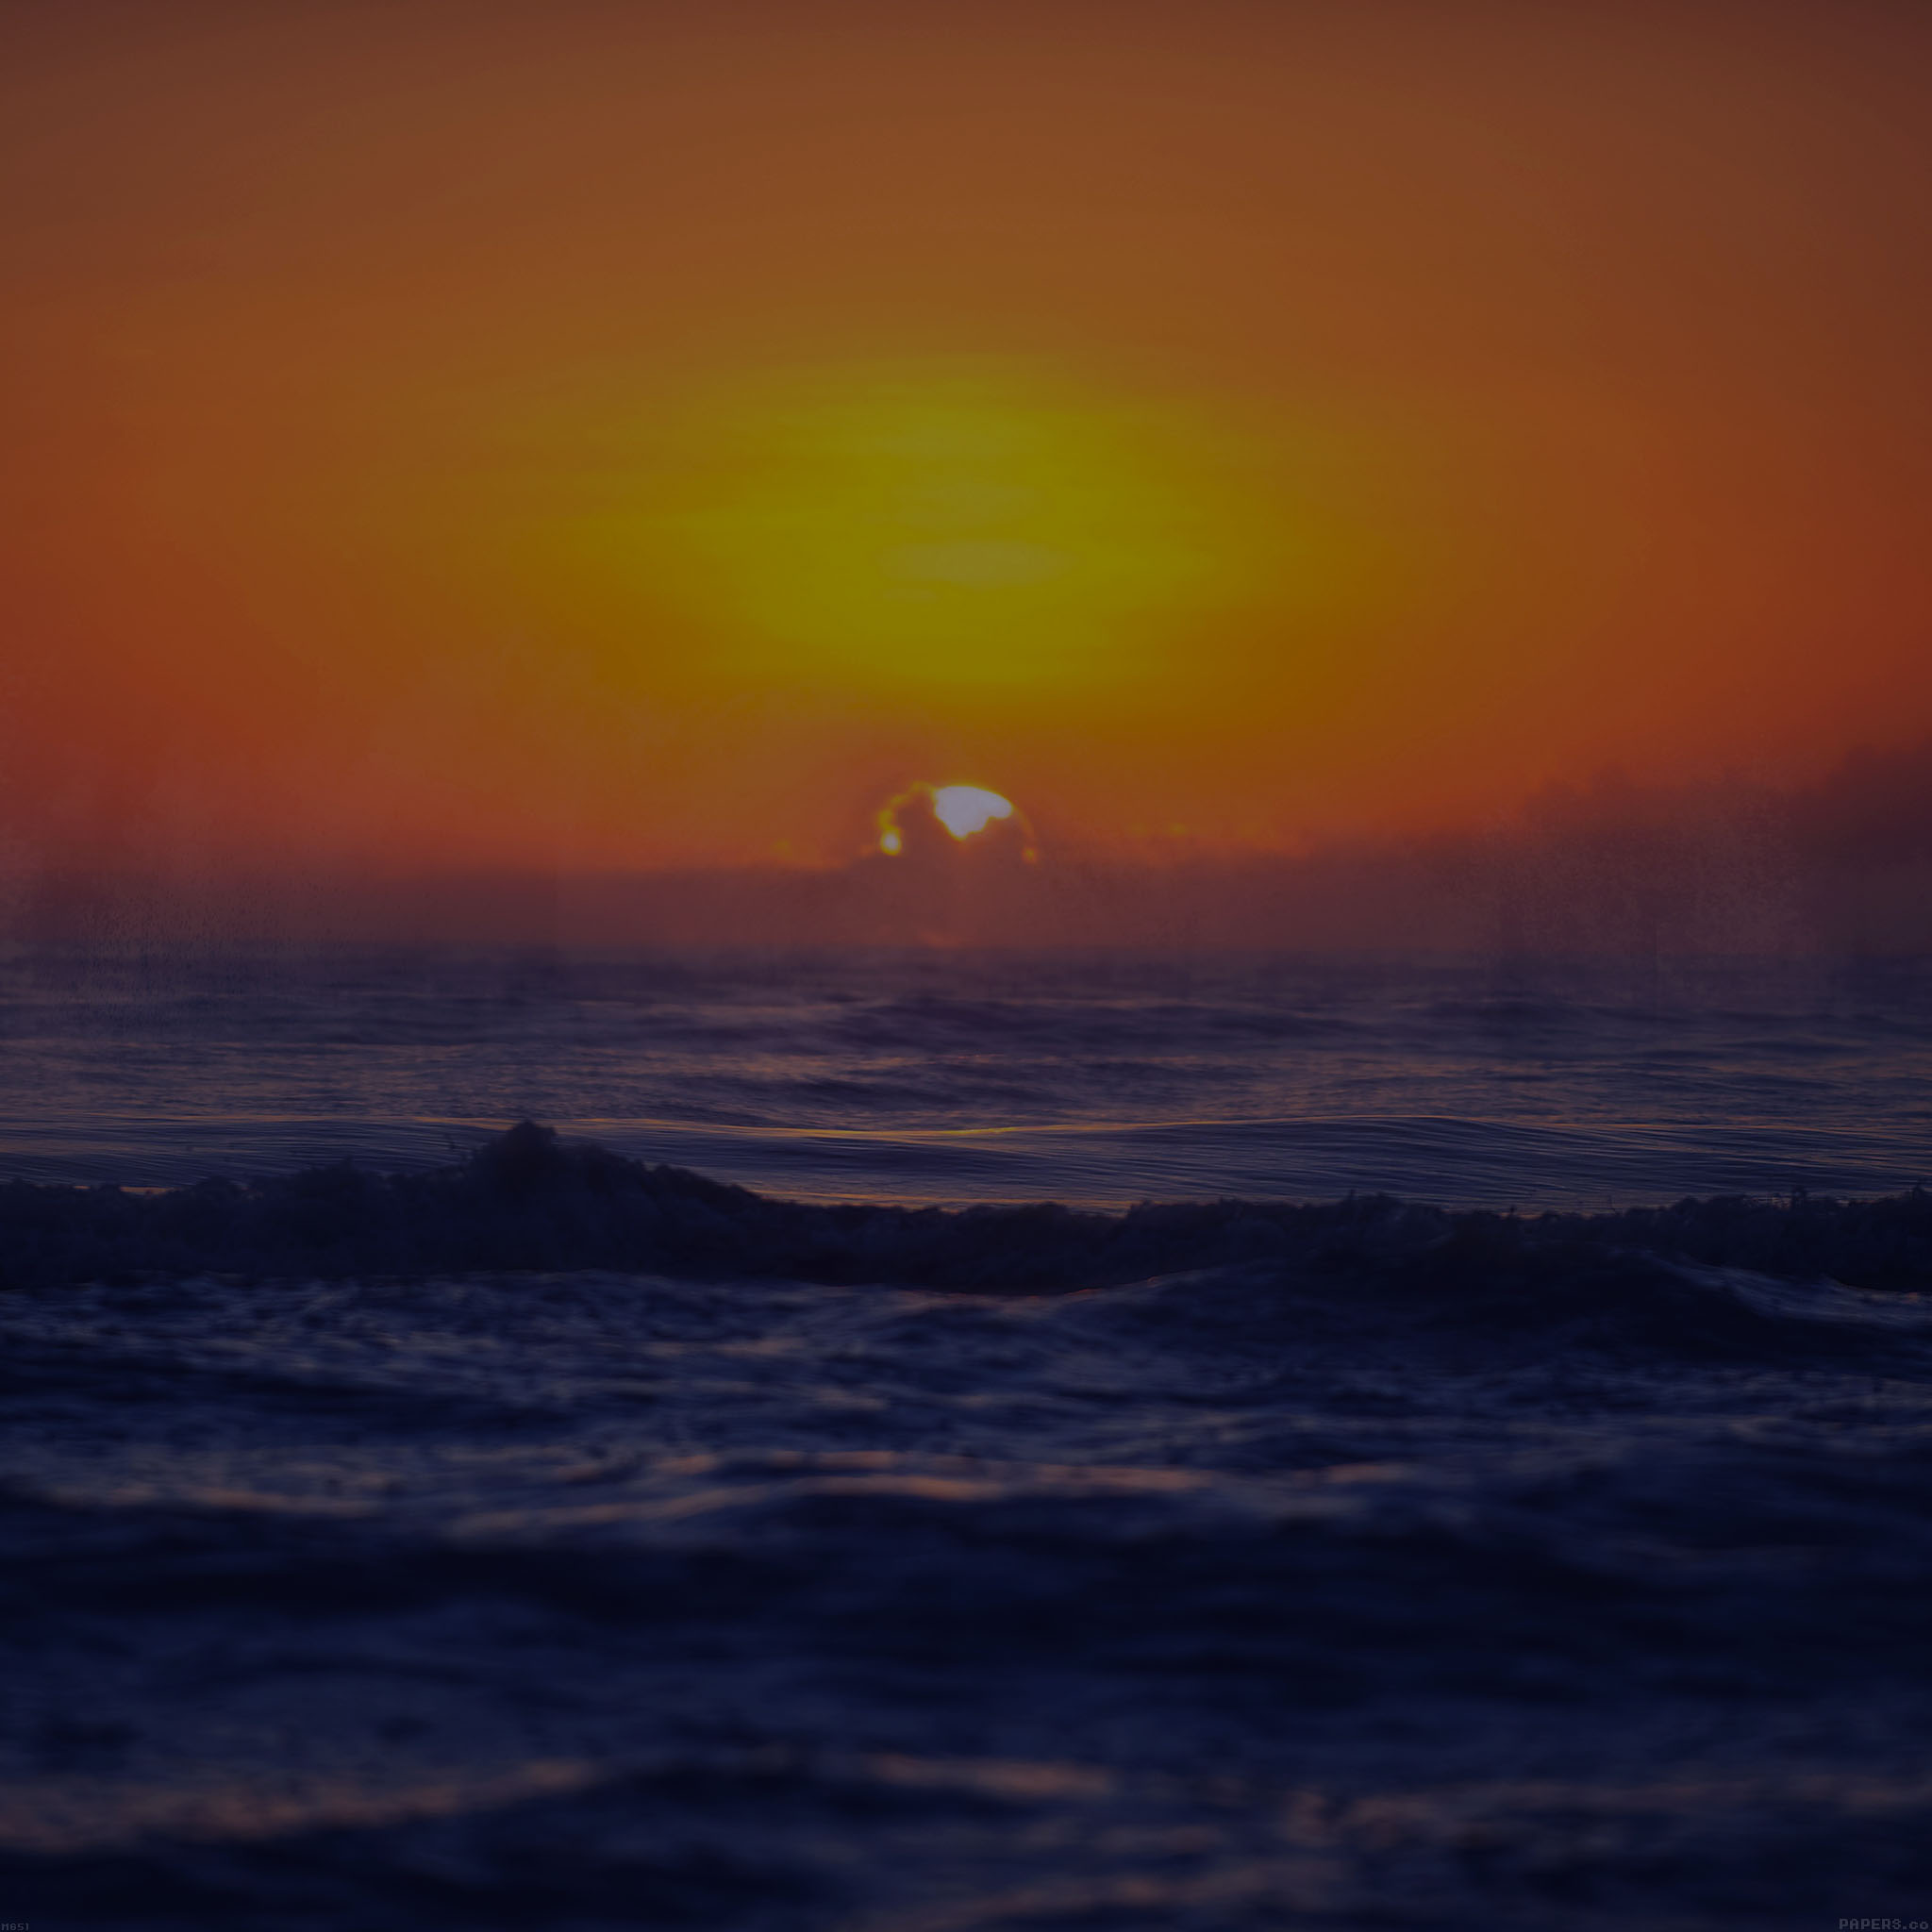 mg51-sea-spray-dark-sunset-ocean-water-nature - Papers co